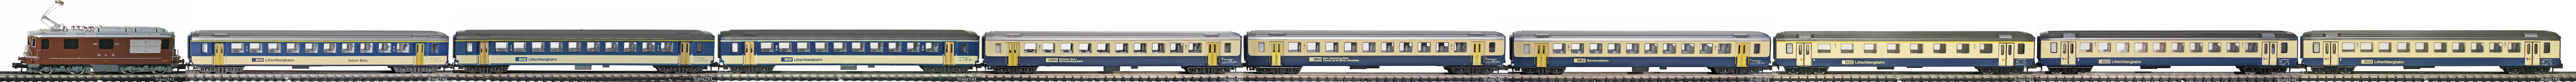 Epoche-IV-BLS-EW-I-Personenzug_Re-4-4-Elok-EW-I-Wagen-neues-Logo